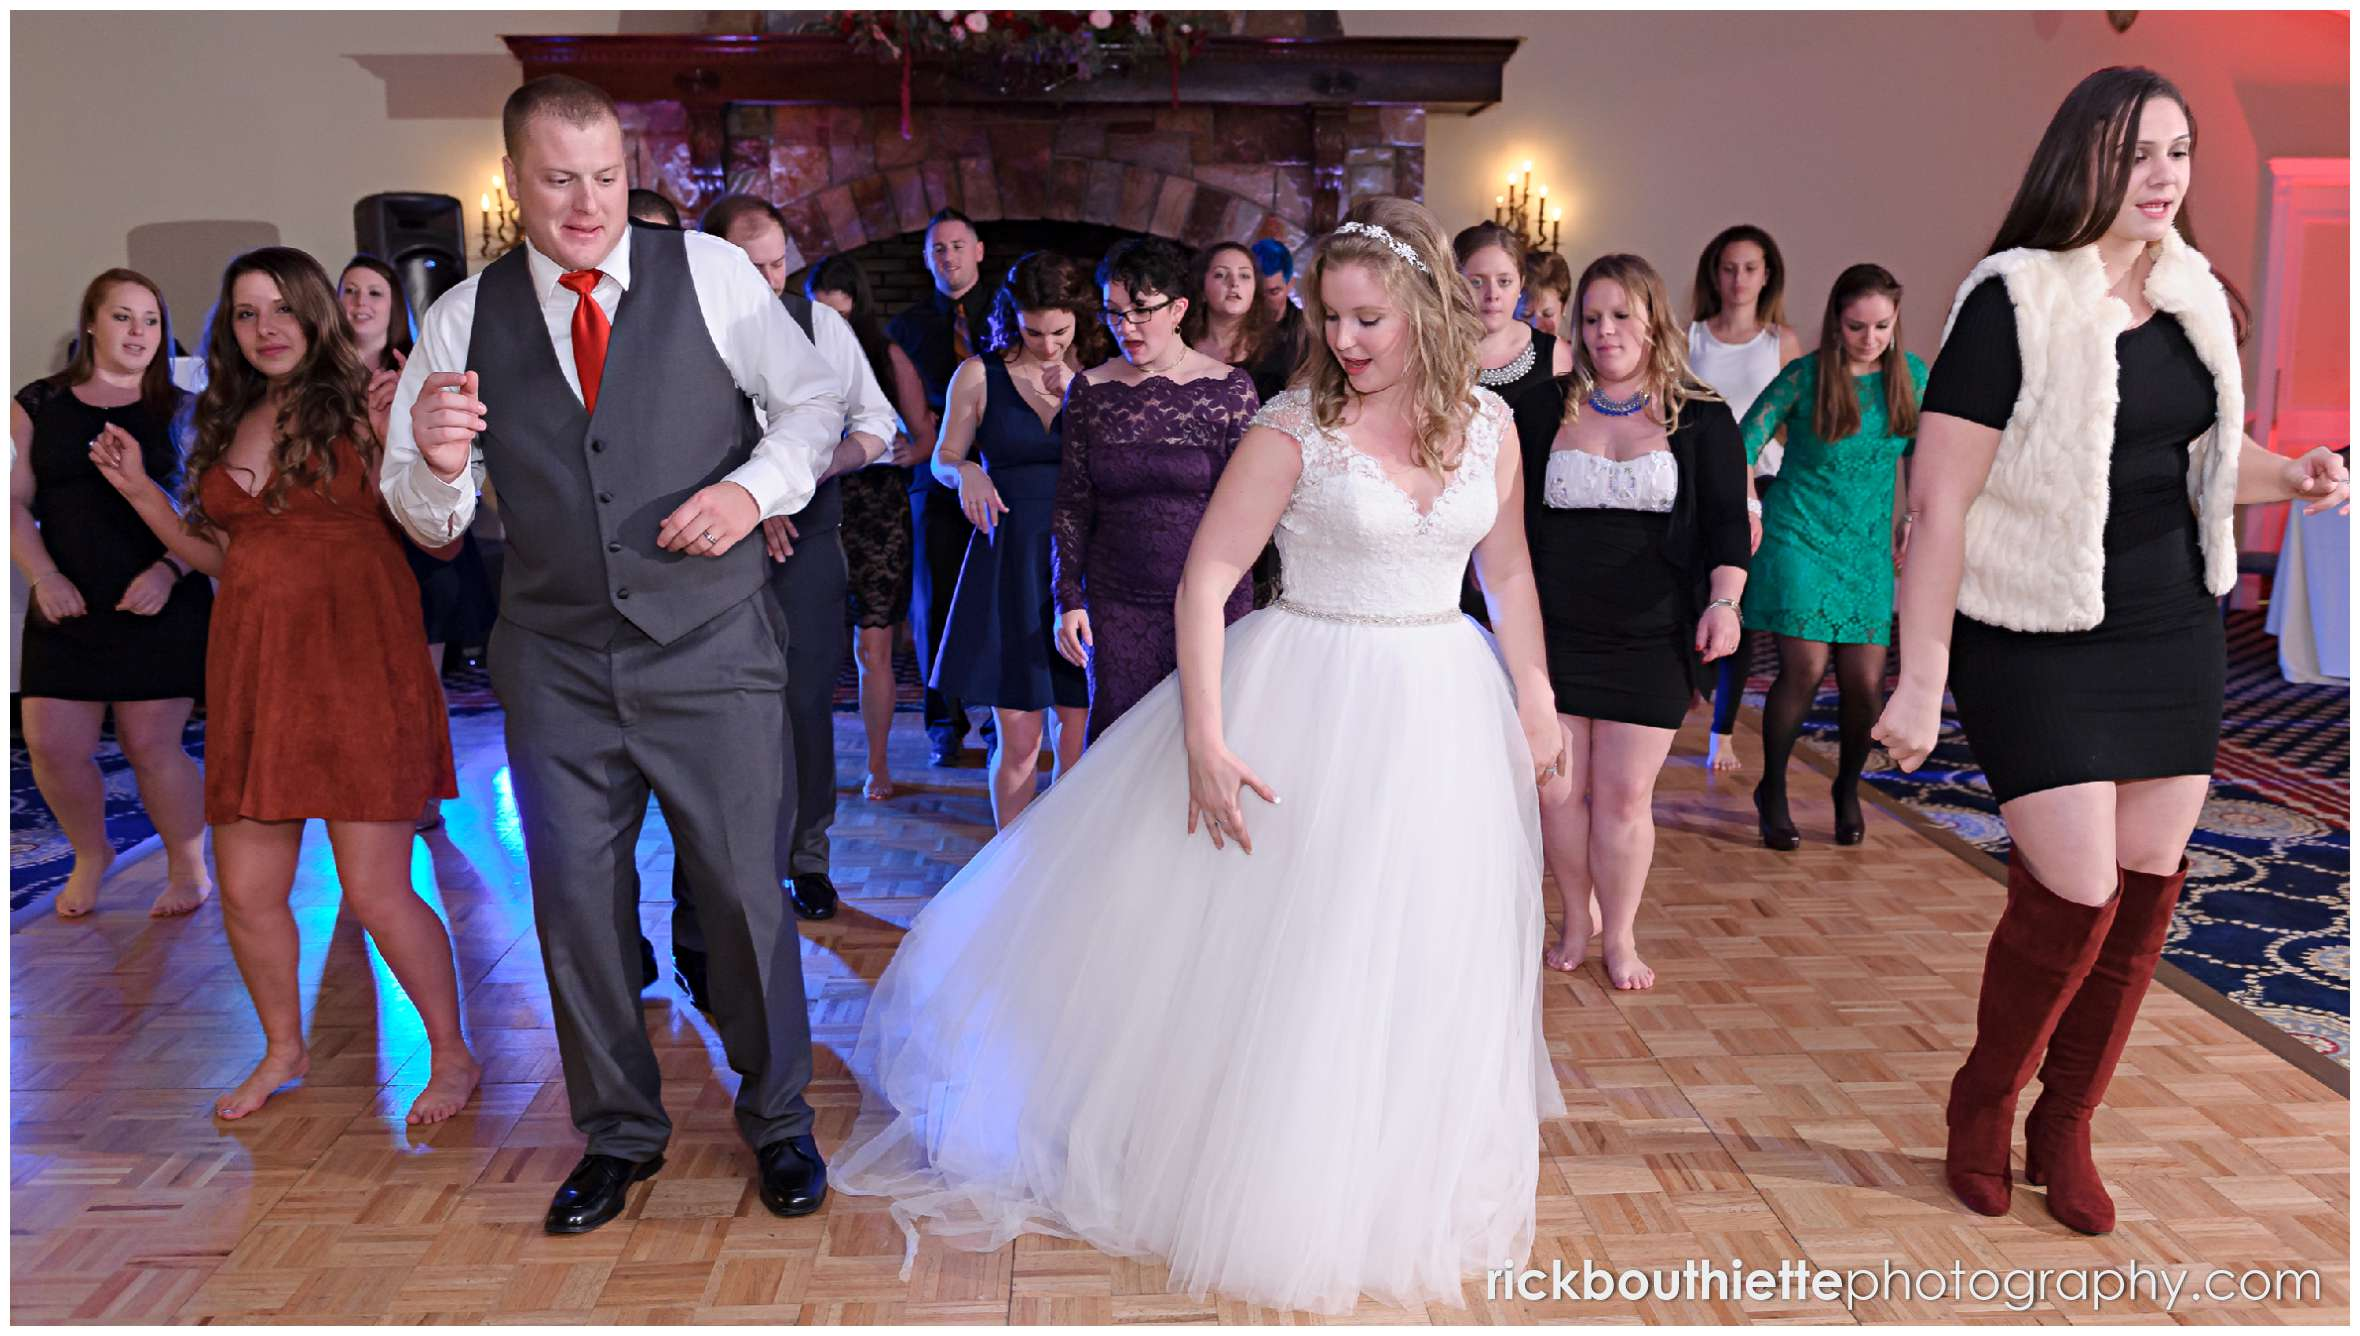 bride and groom dancing with guests in Presidential Promenade wedding